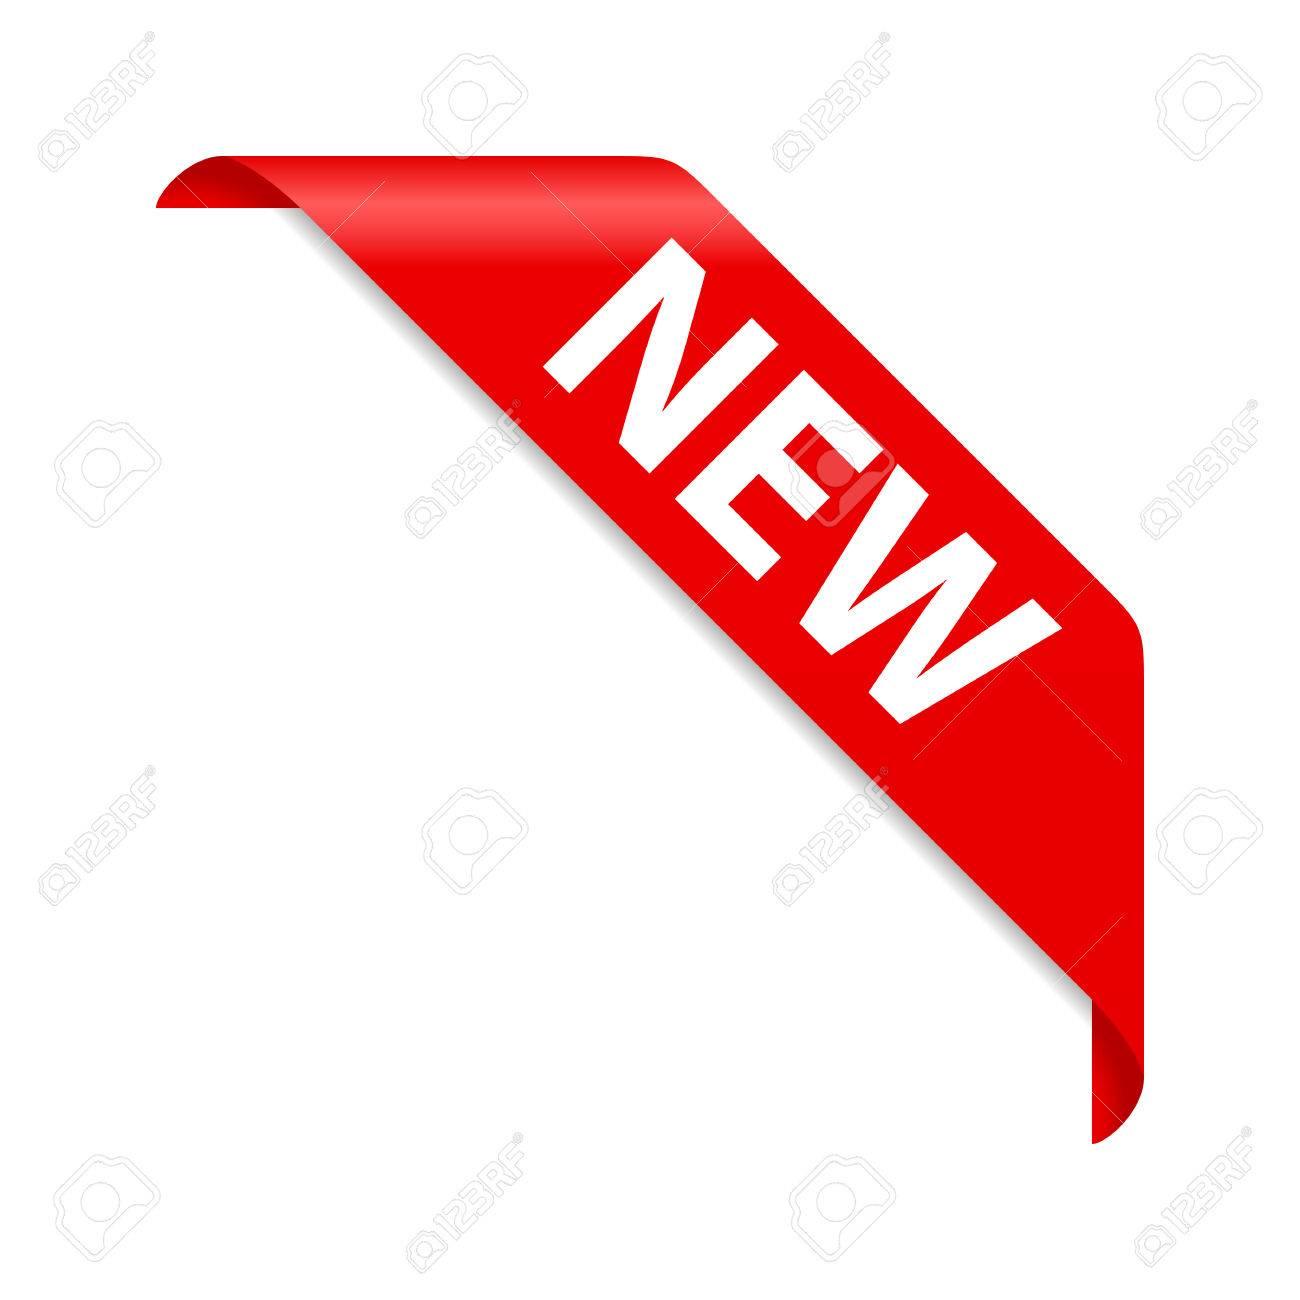 New badge - 55160727